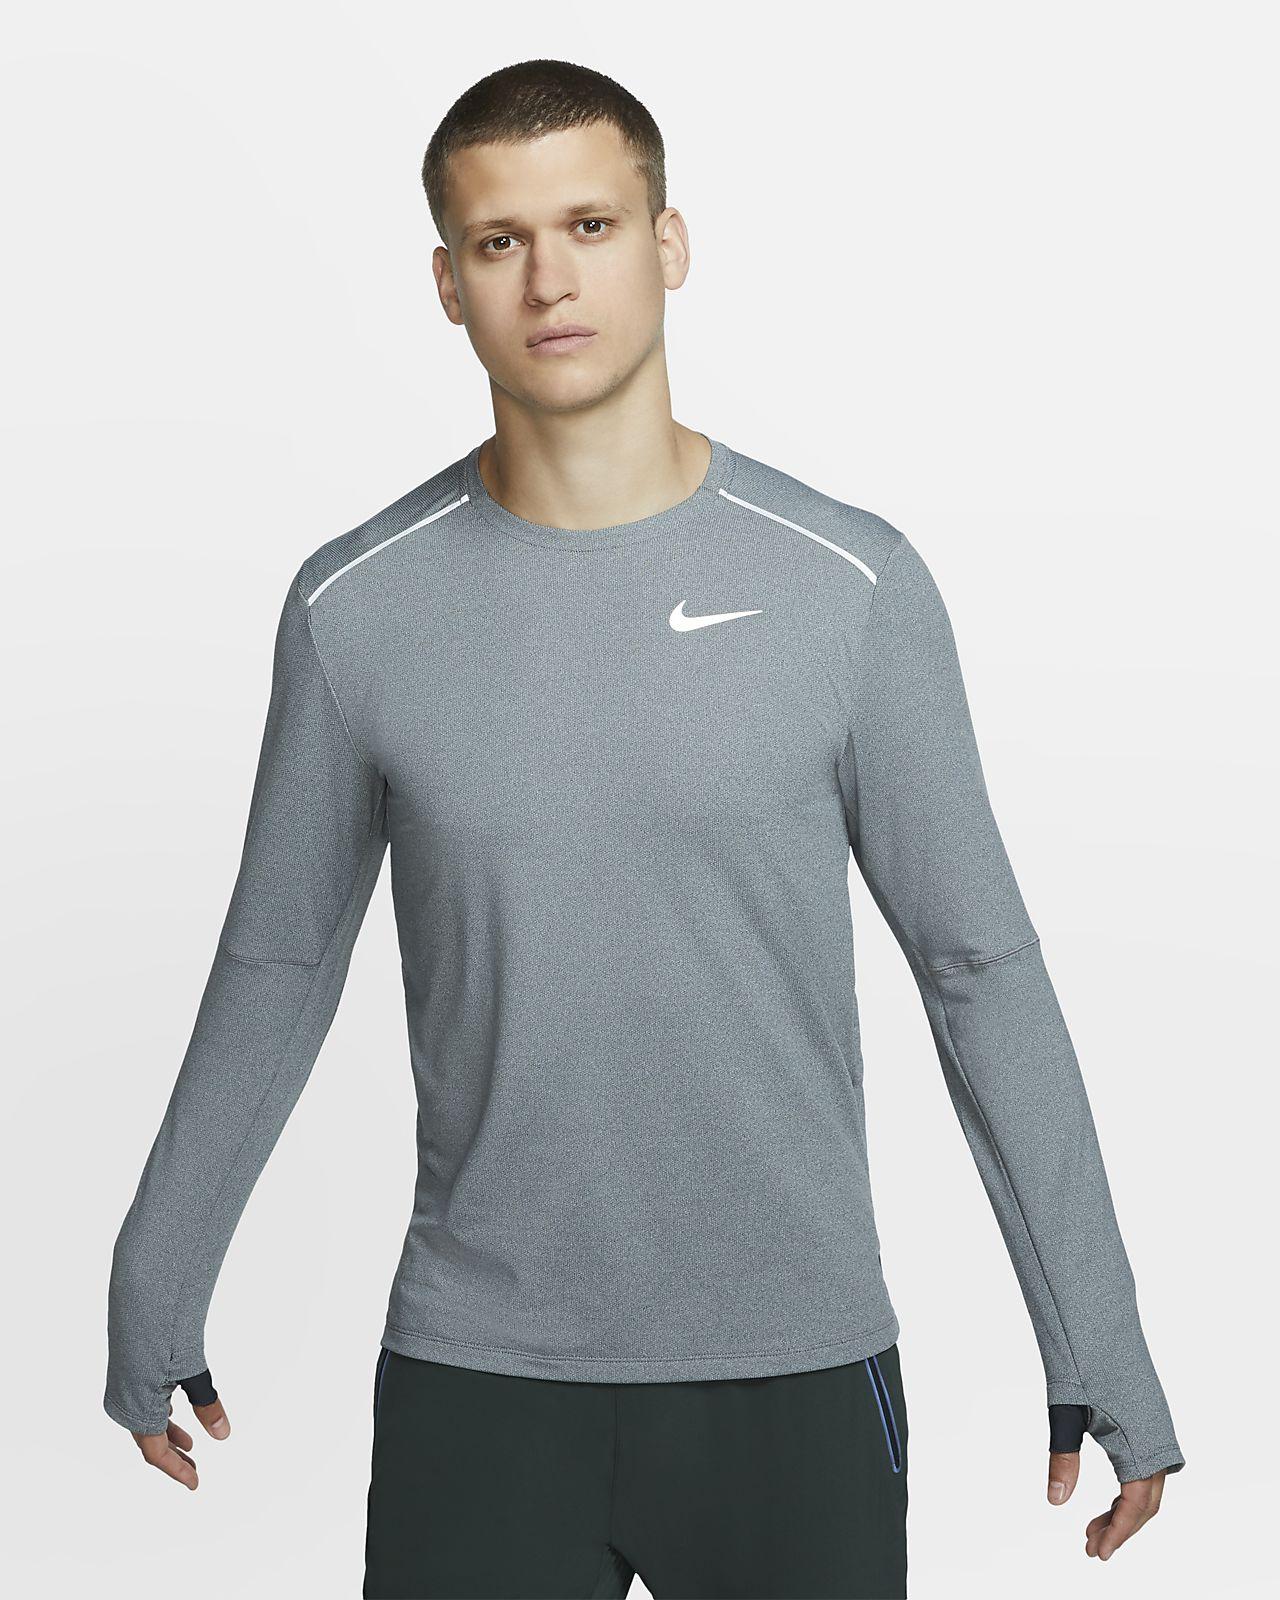 Nike Element 3.0 Men's Running Crew